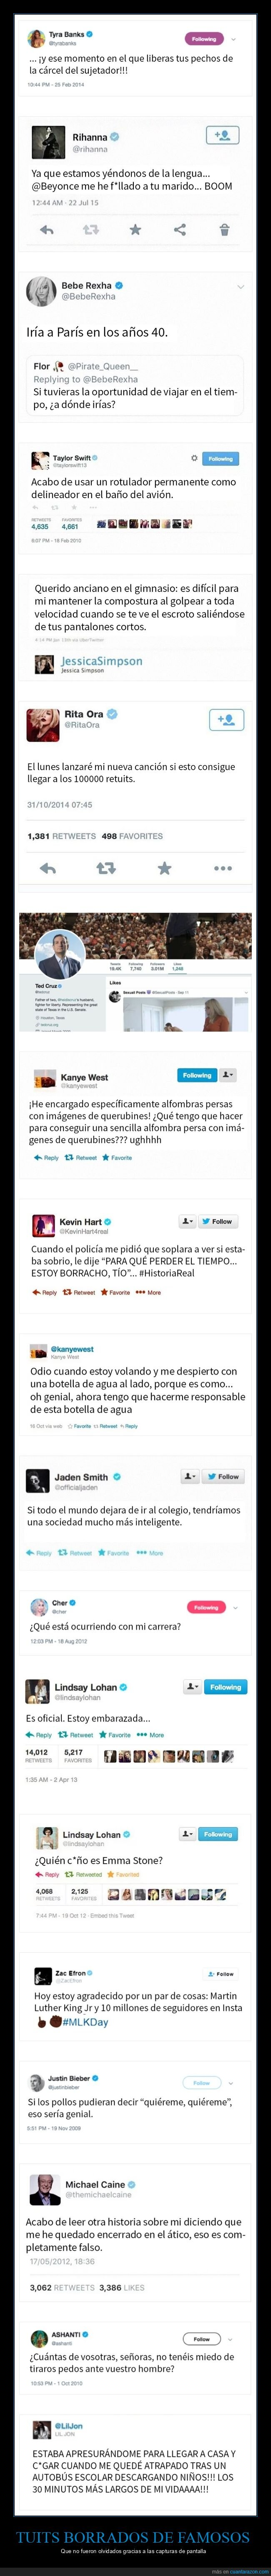 capturas de pantalla,famosos,tweets borrados